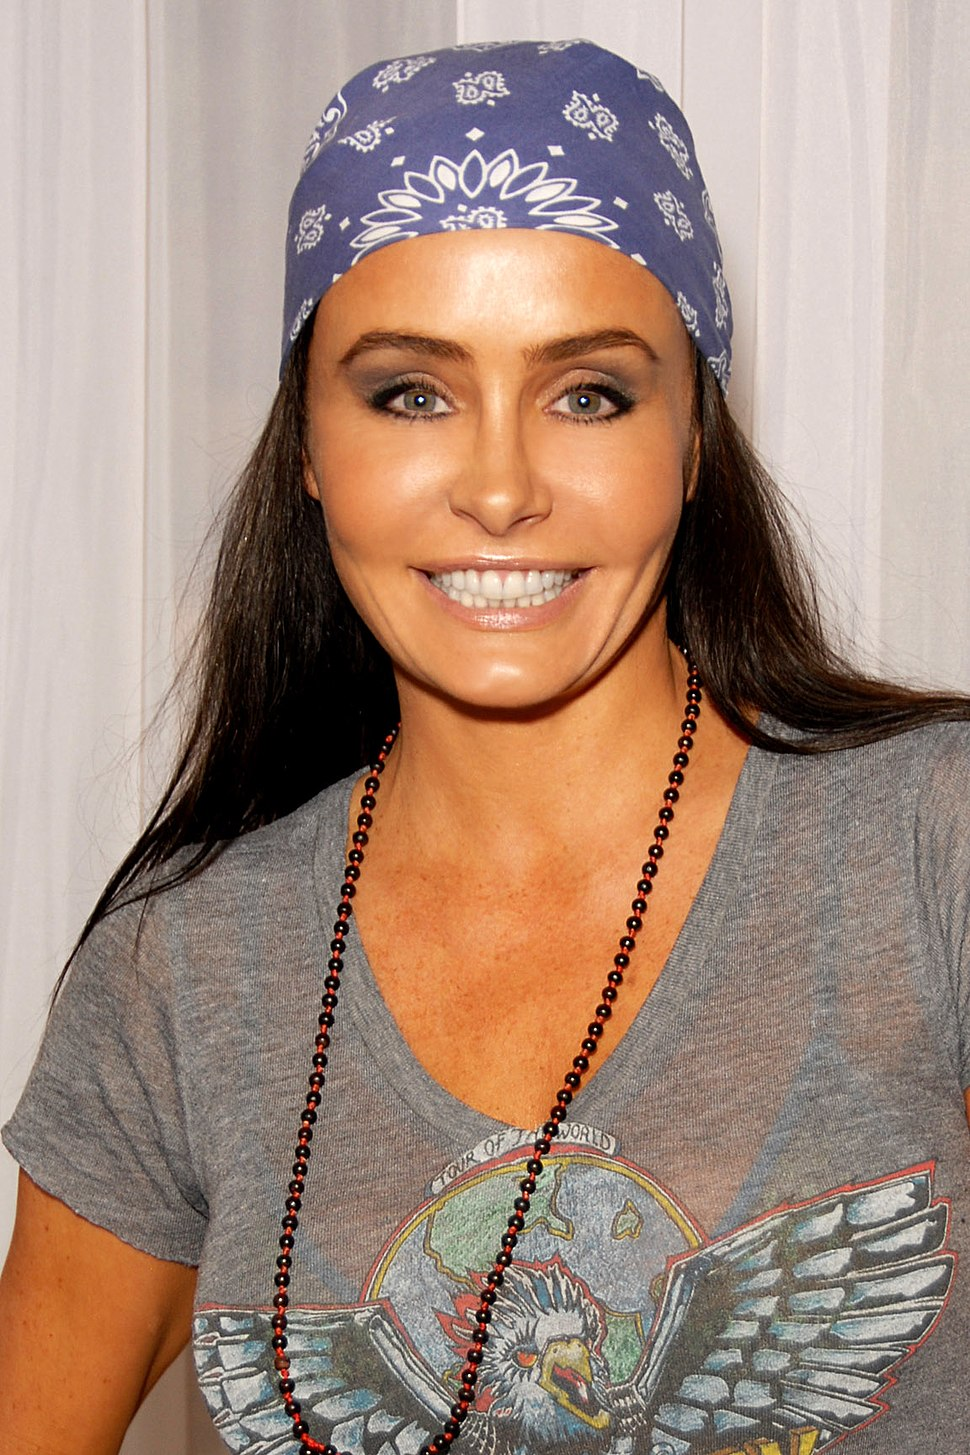 Kelli McCarty 2010